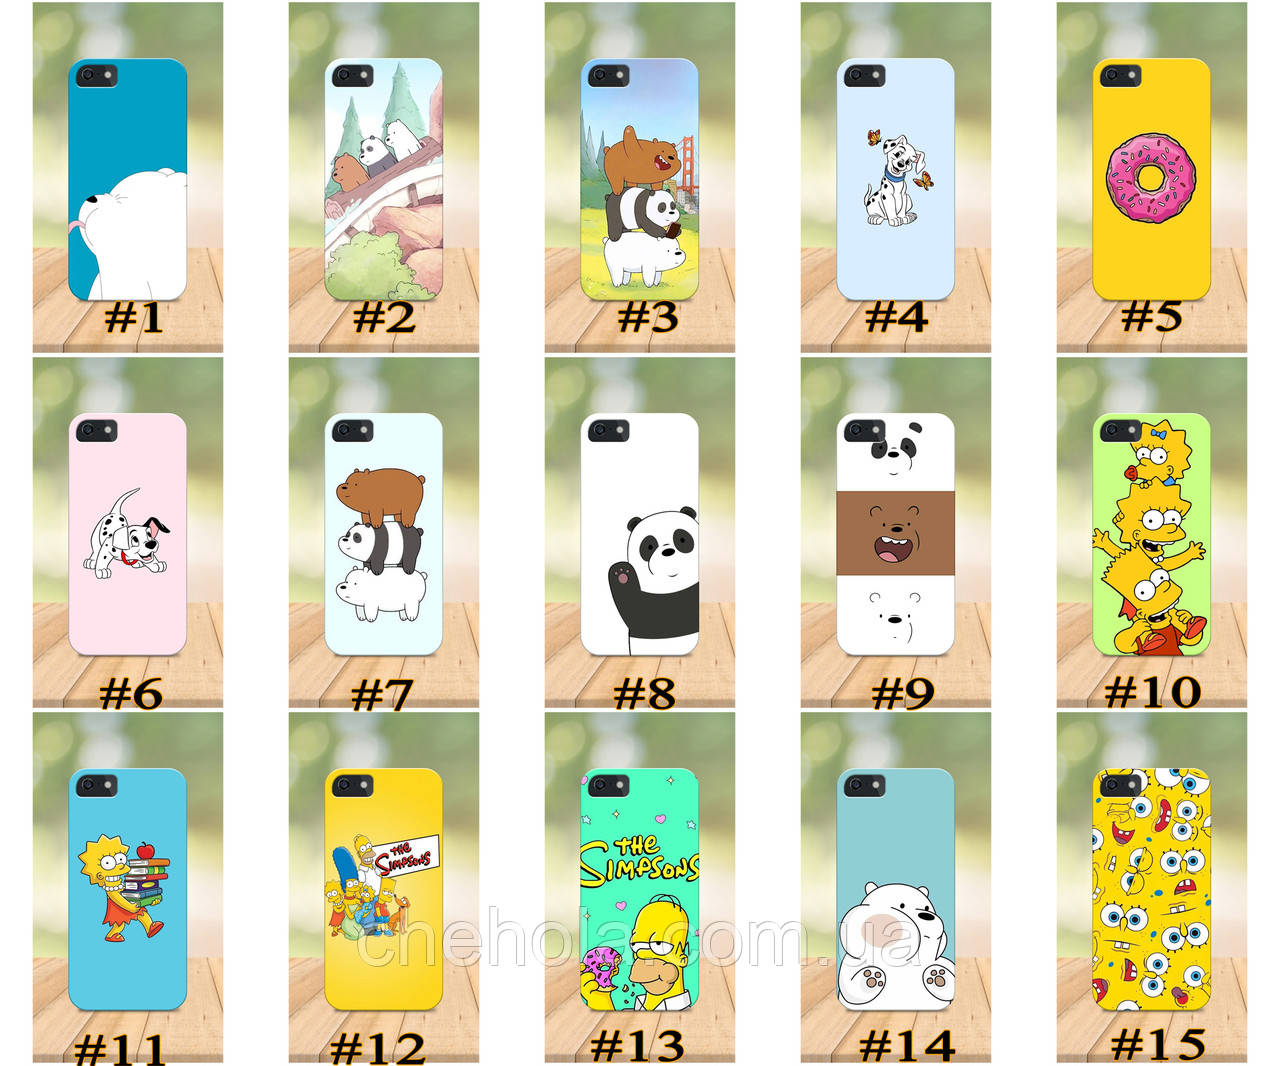 Чехол на iPhone 5 5s SE 4 4S бампер накладка с принтом Мультфильм Симпсоны Габка Боб We bare bears